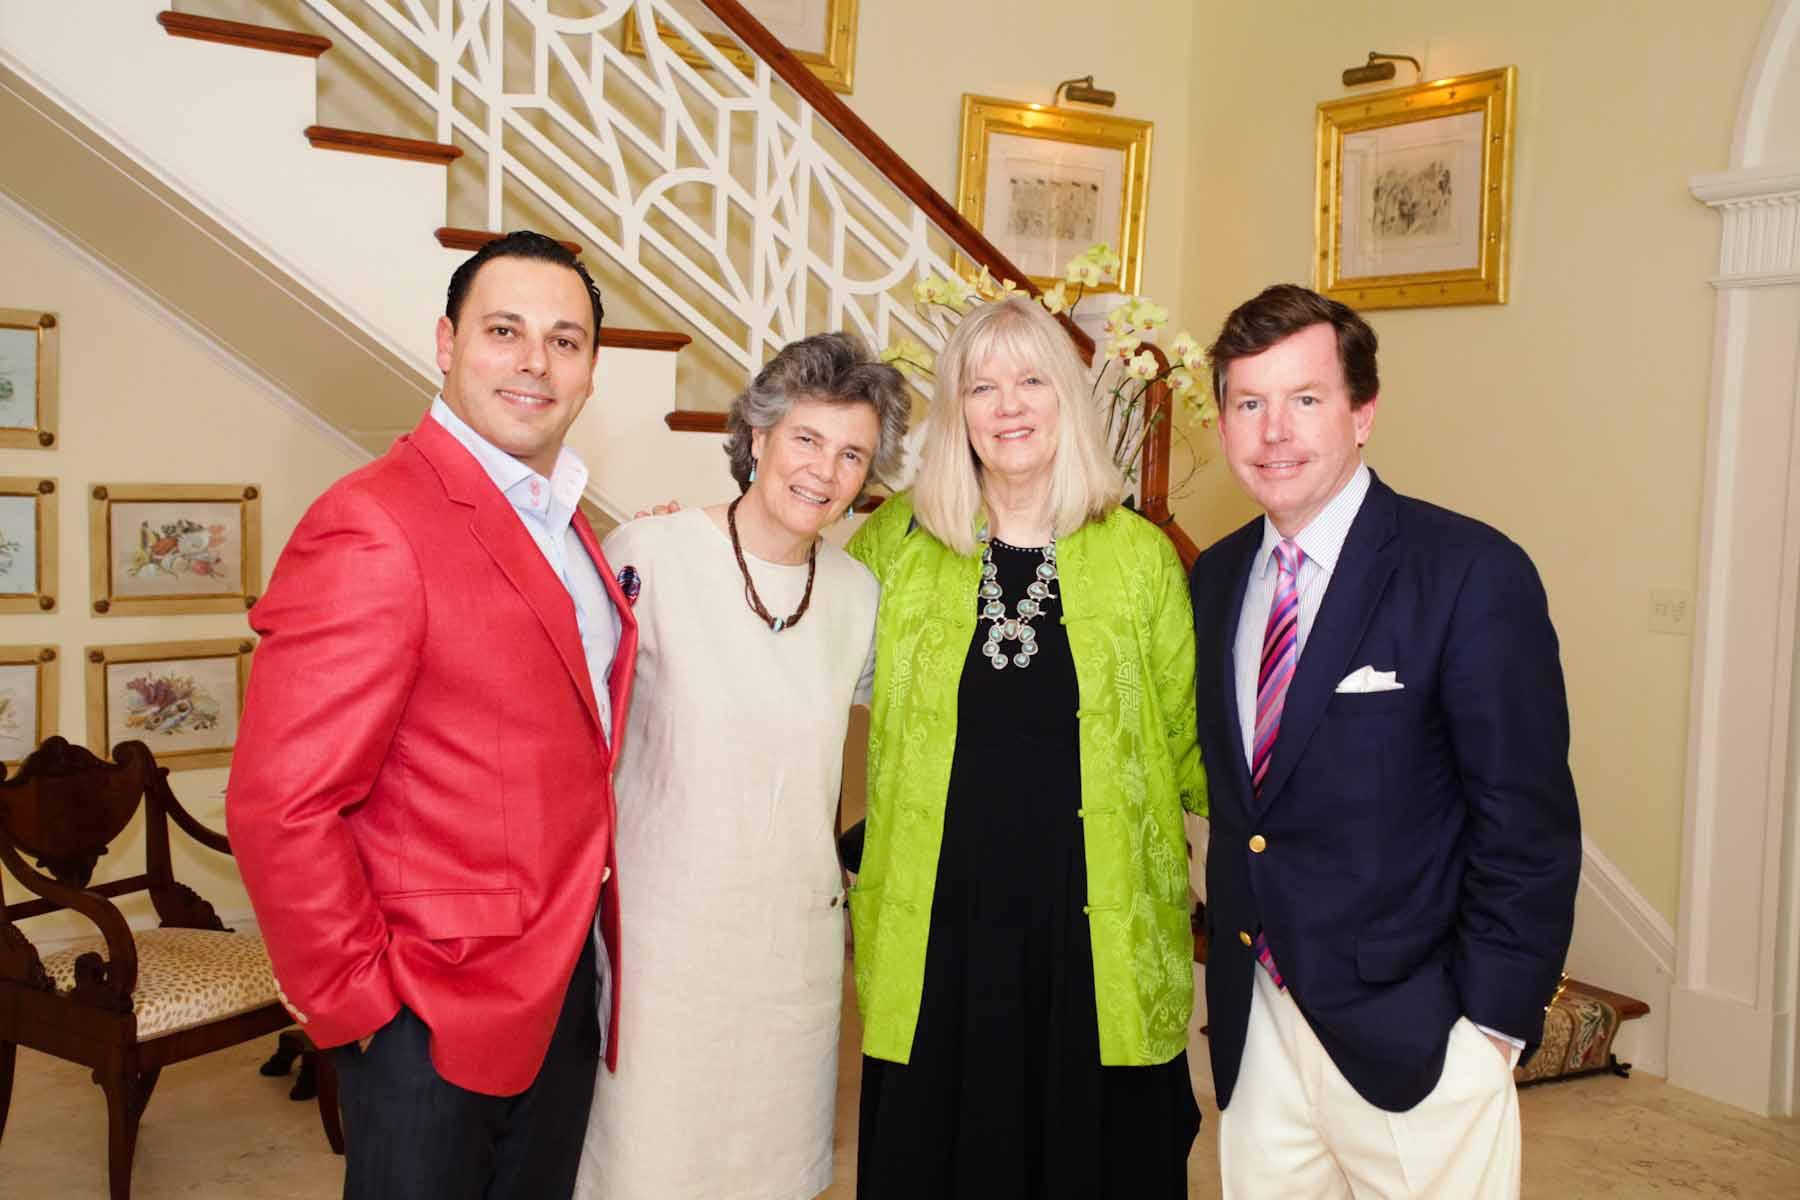 01AA  David Rosenberg, Moira Forbes Mumma, Diane N. Weiss, and Tom Quick